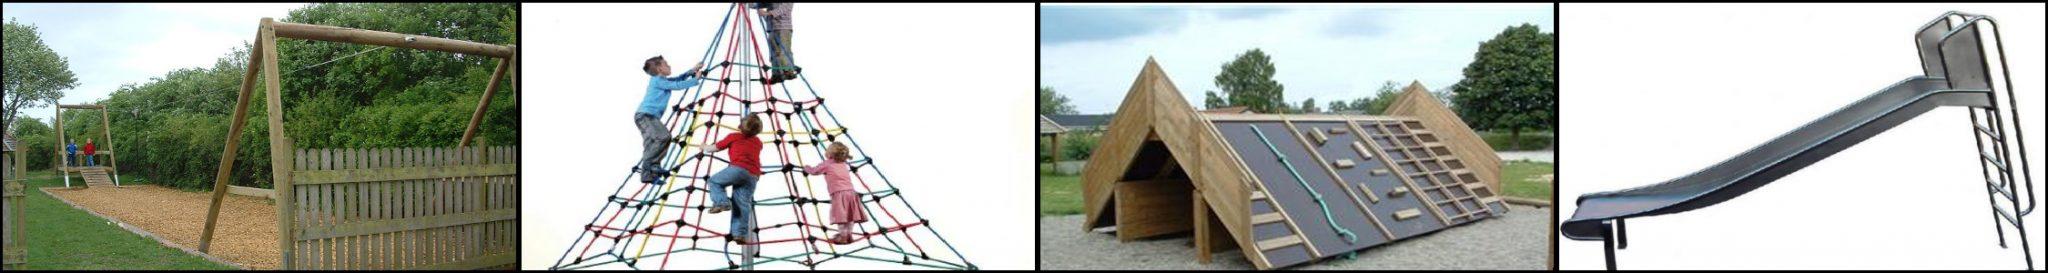 klatresystemer, svævebaner og rutchebaner